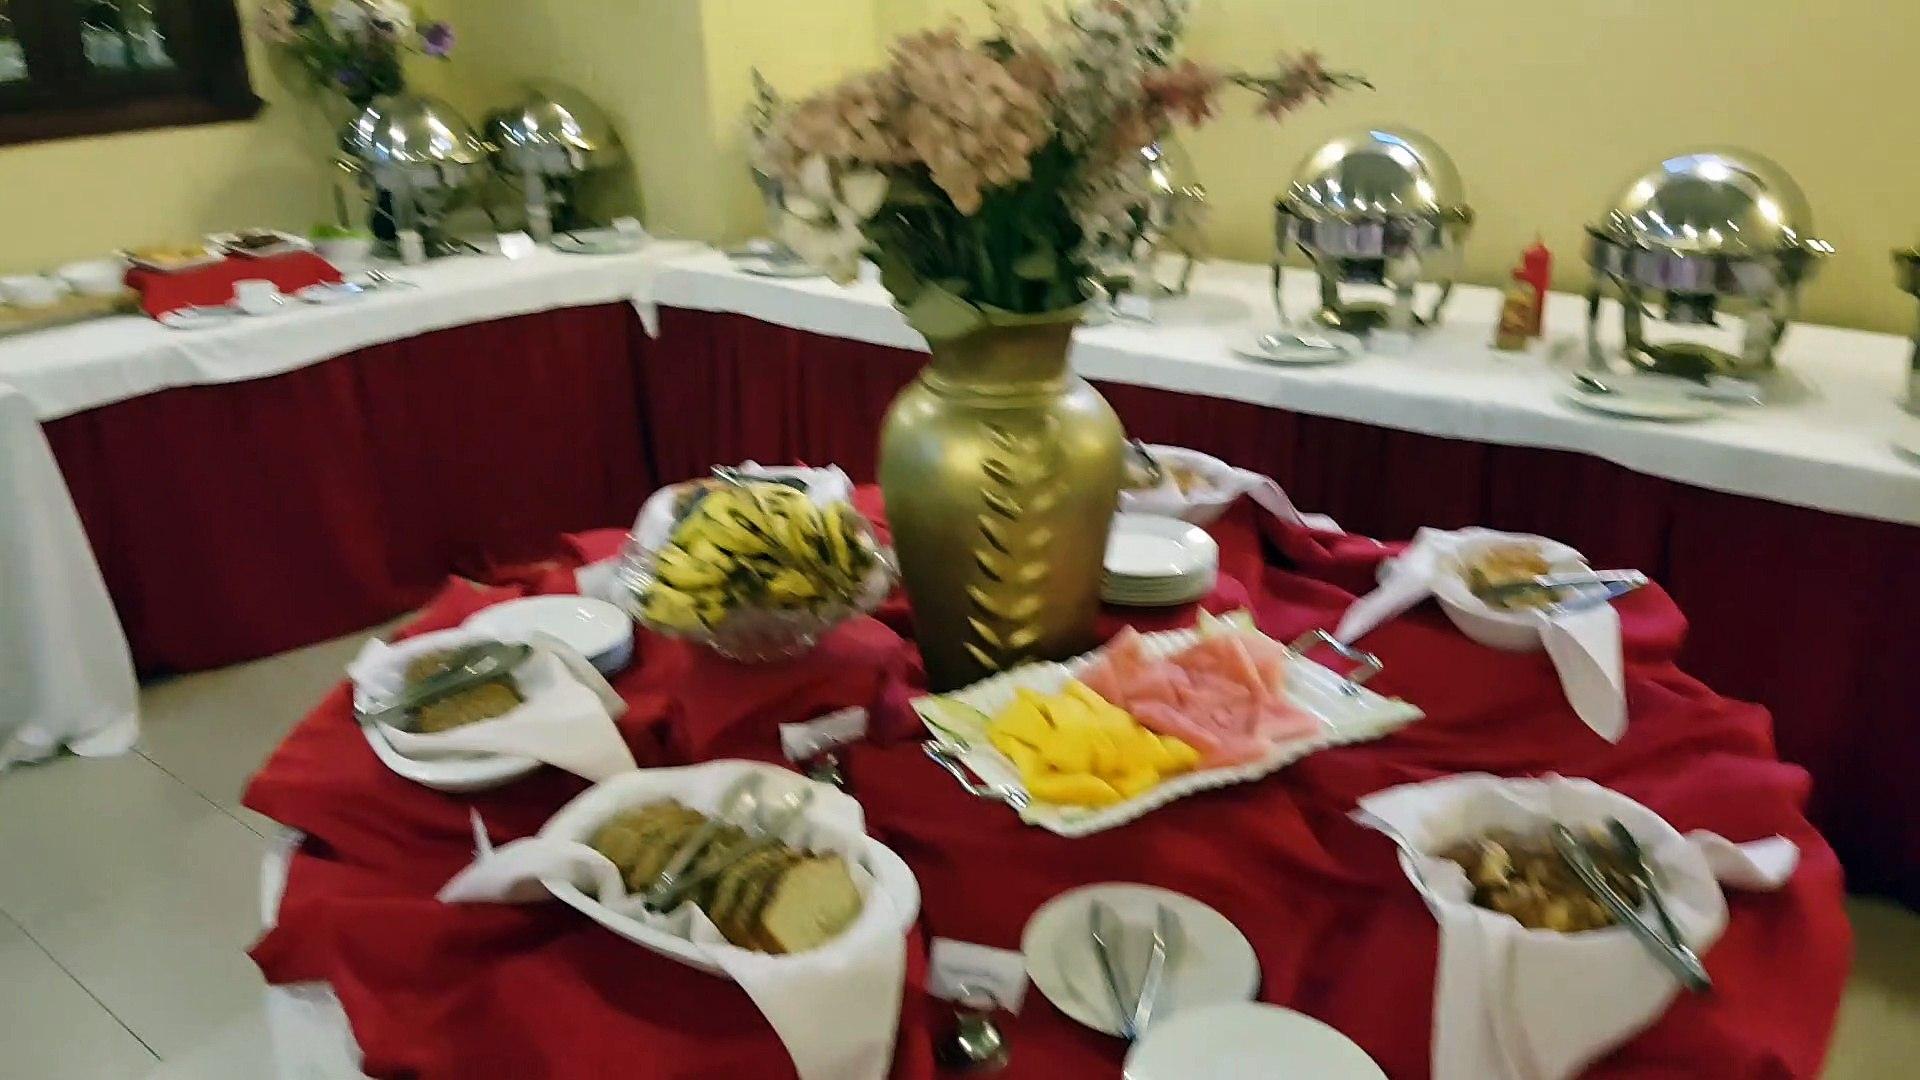 Breakfast in the Addis Regency Hotel - Addis Ababa, Ethiopia